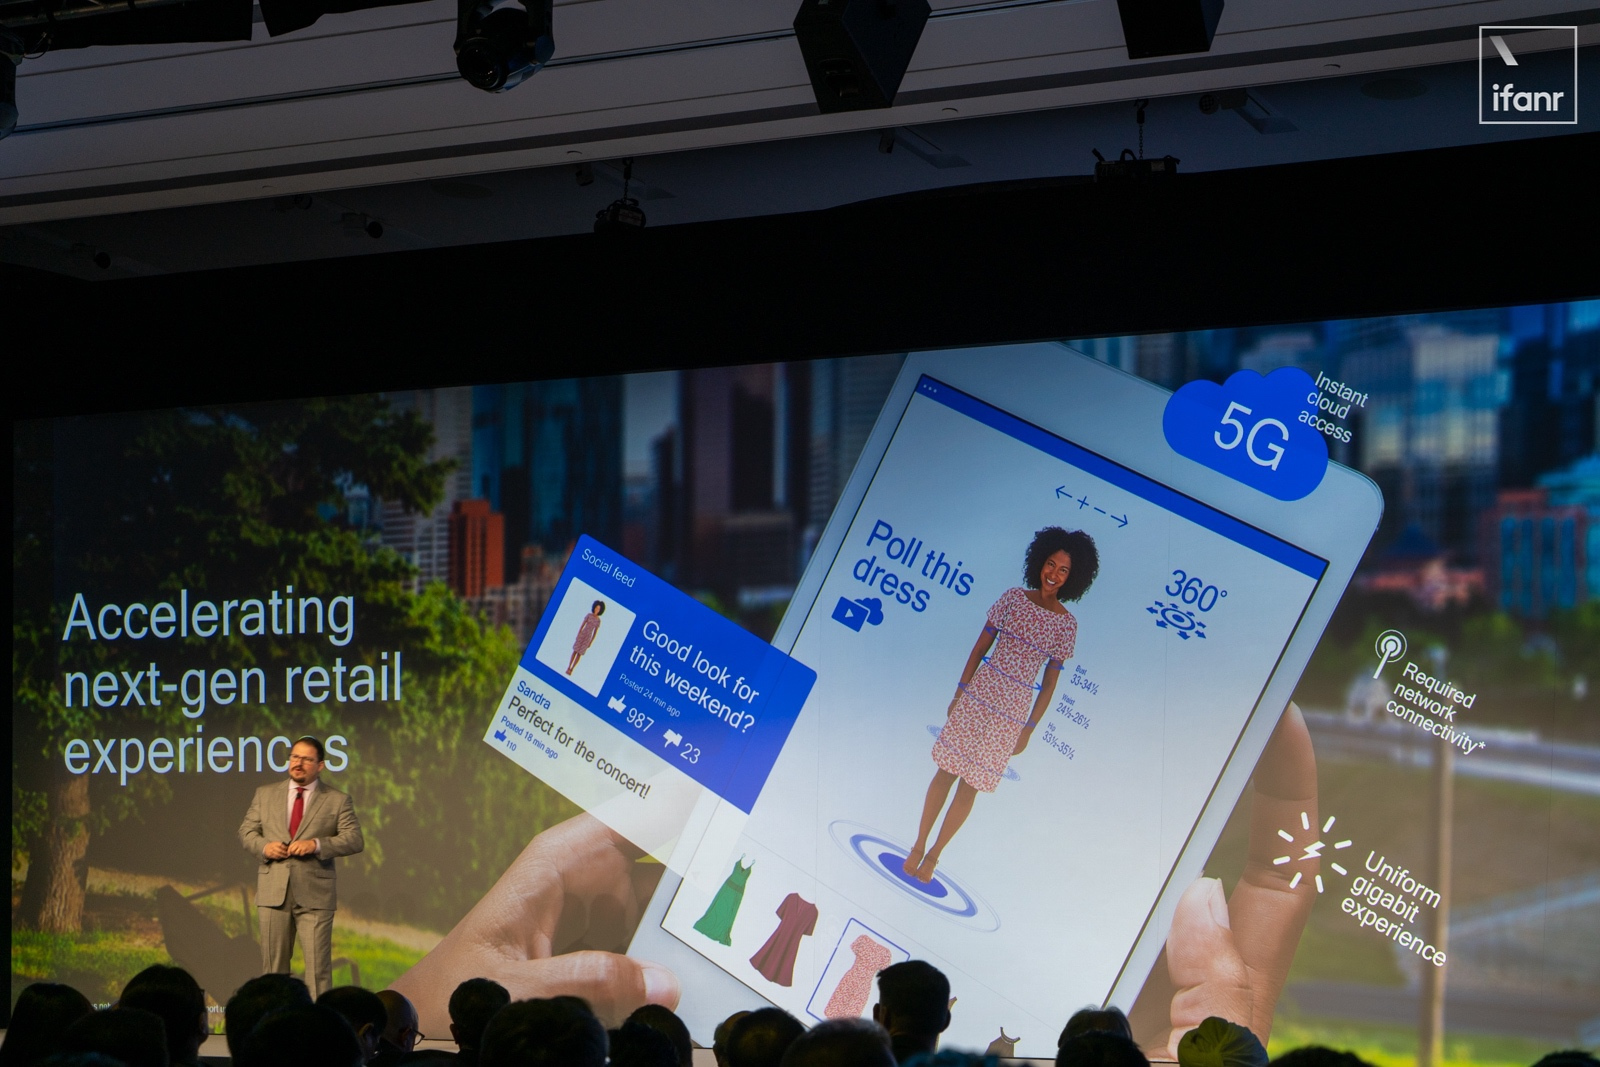 5G 时代的高通,想要覆盖 1000 亿美元的广阔市场  移动互联  第3张